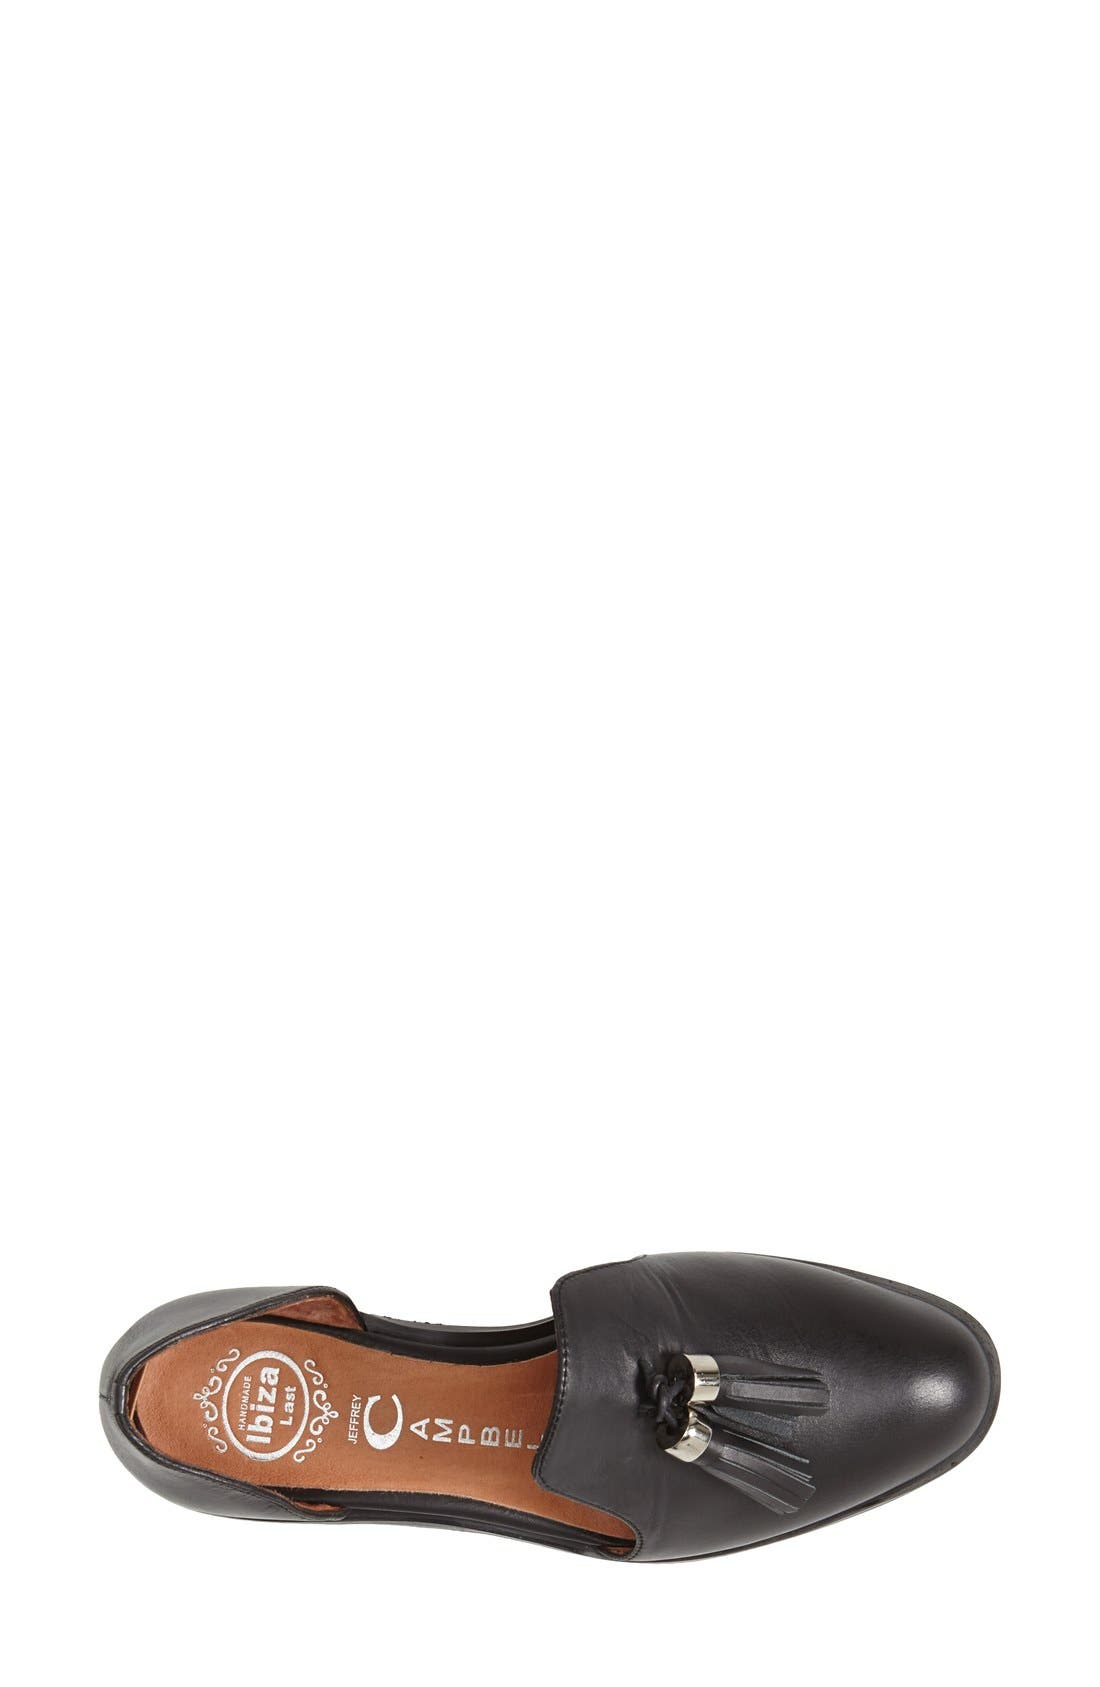 JEFFREY CAMPBELL, 'Open Case' Tasseled Leather Flat, Alternate thumbnail 4, color, 001